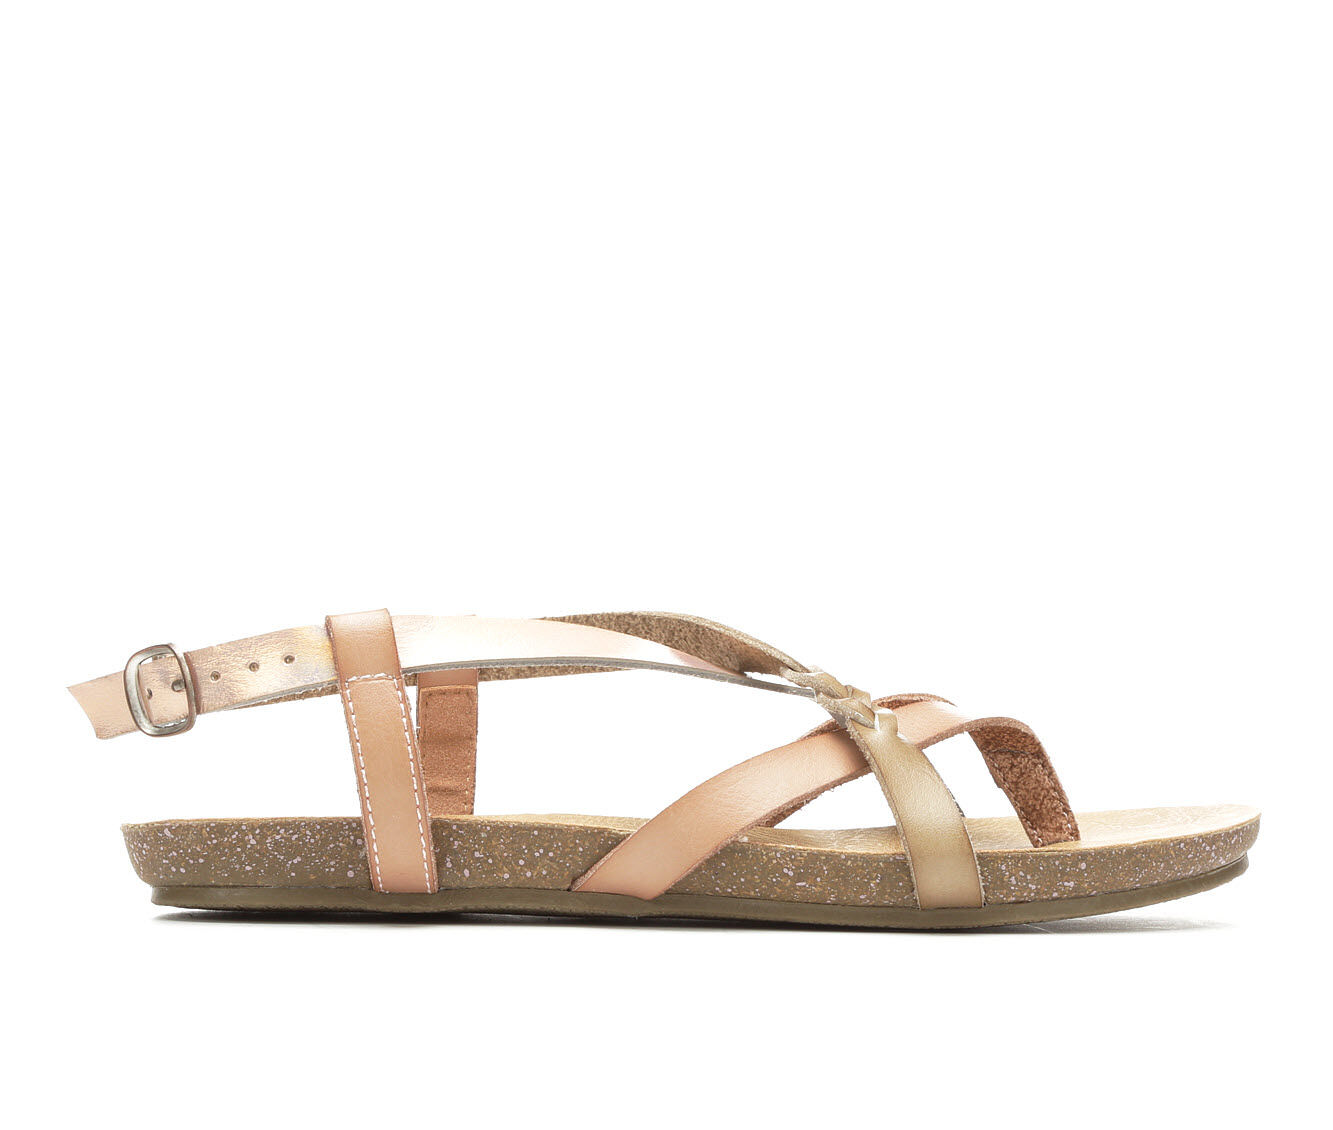 Women's Blowfish Malibu Granola B Footbed Sandals